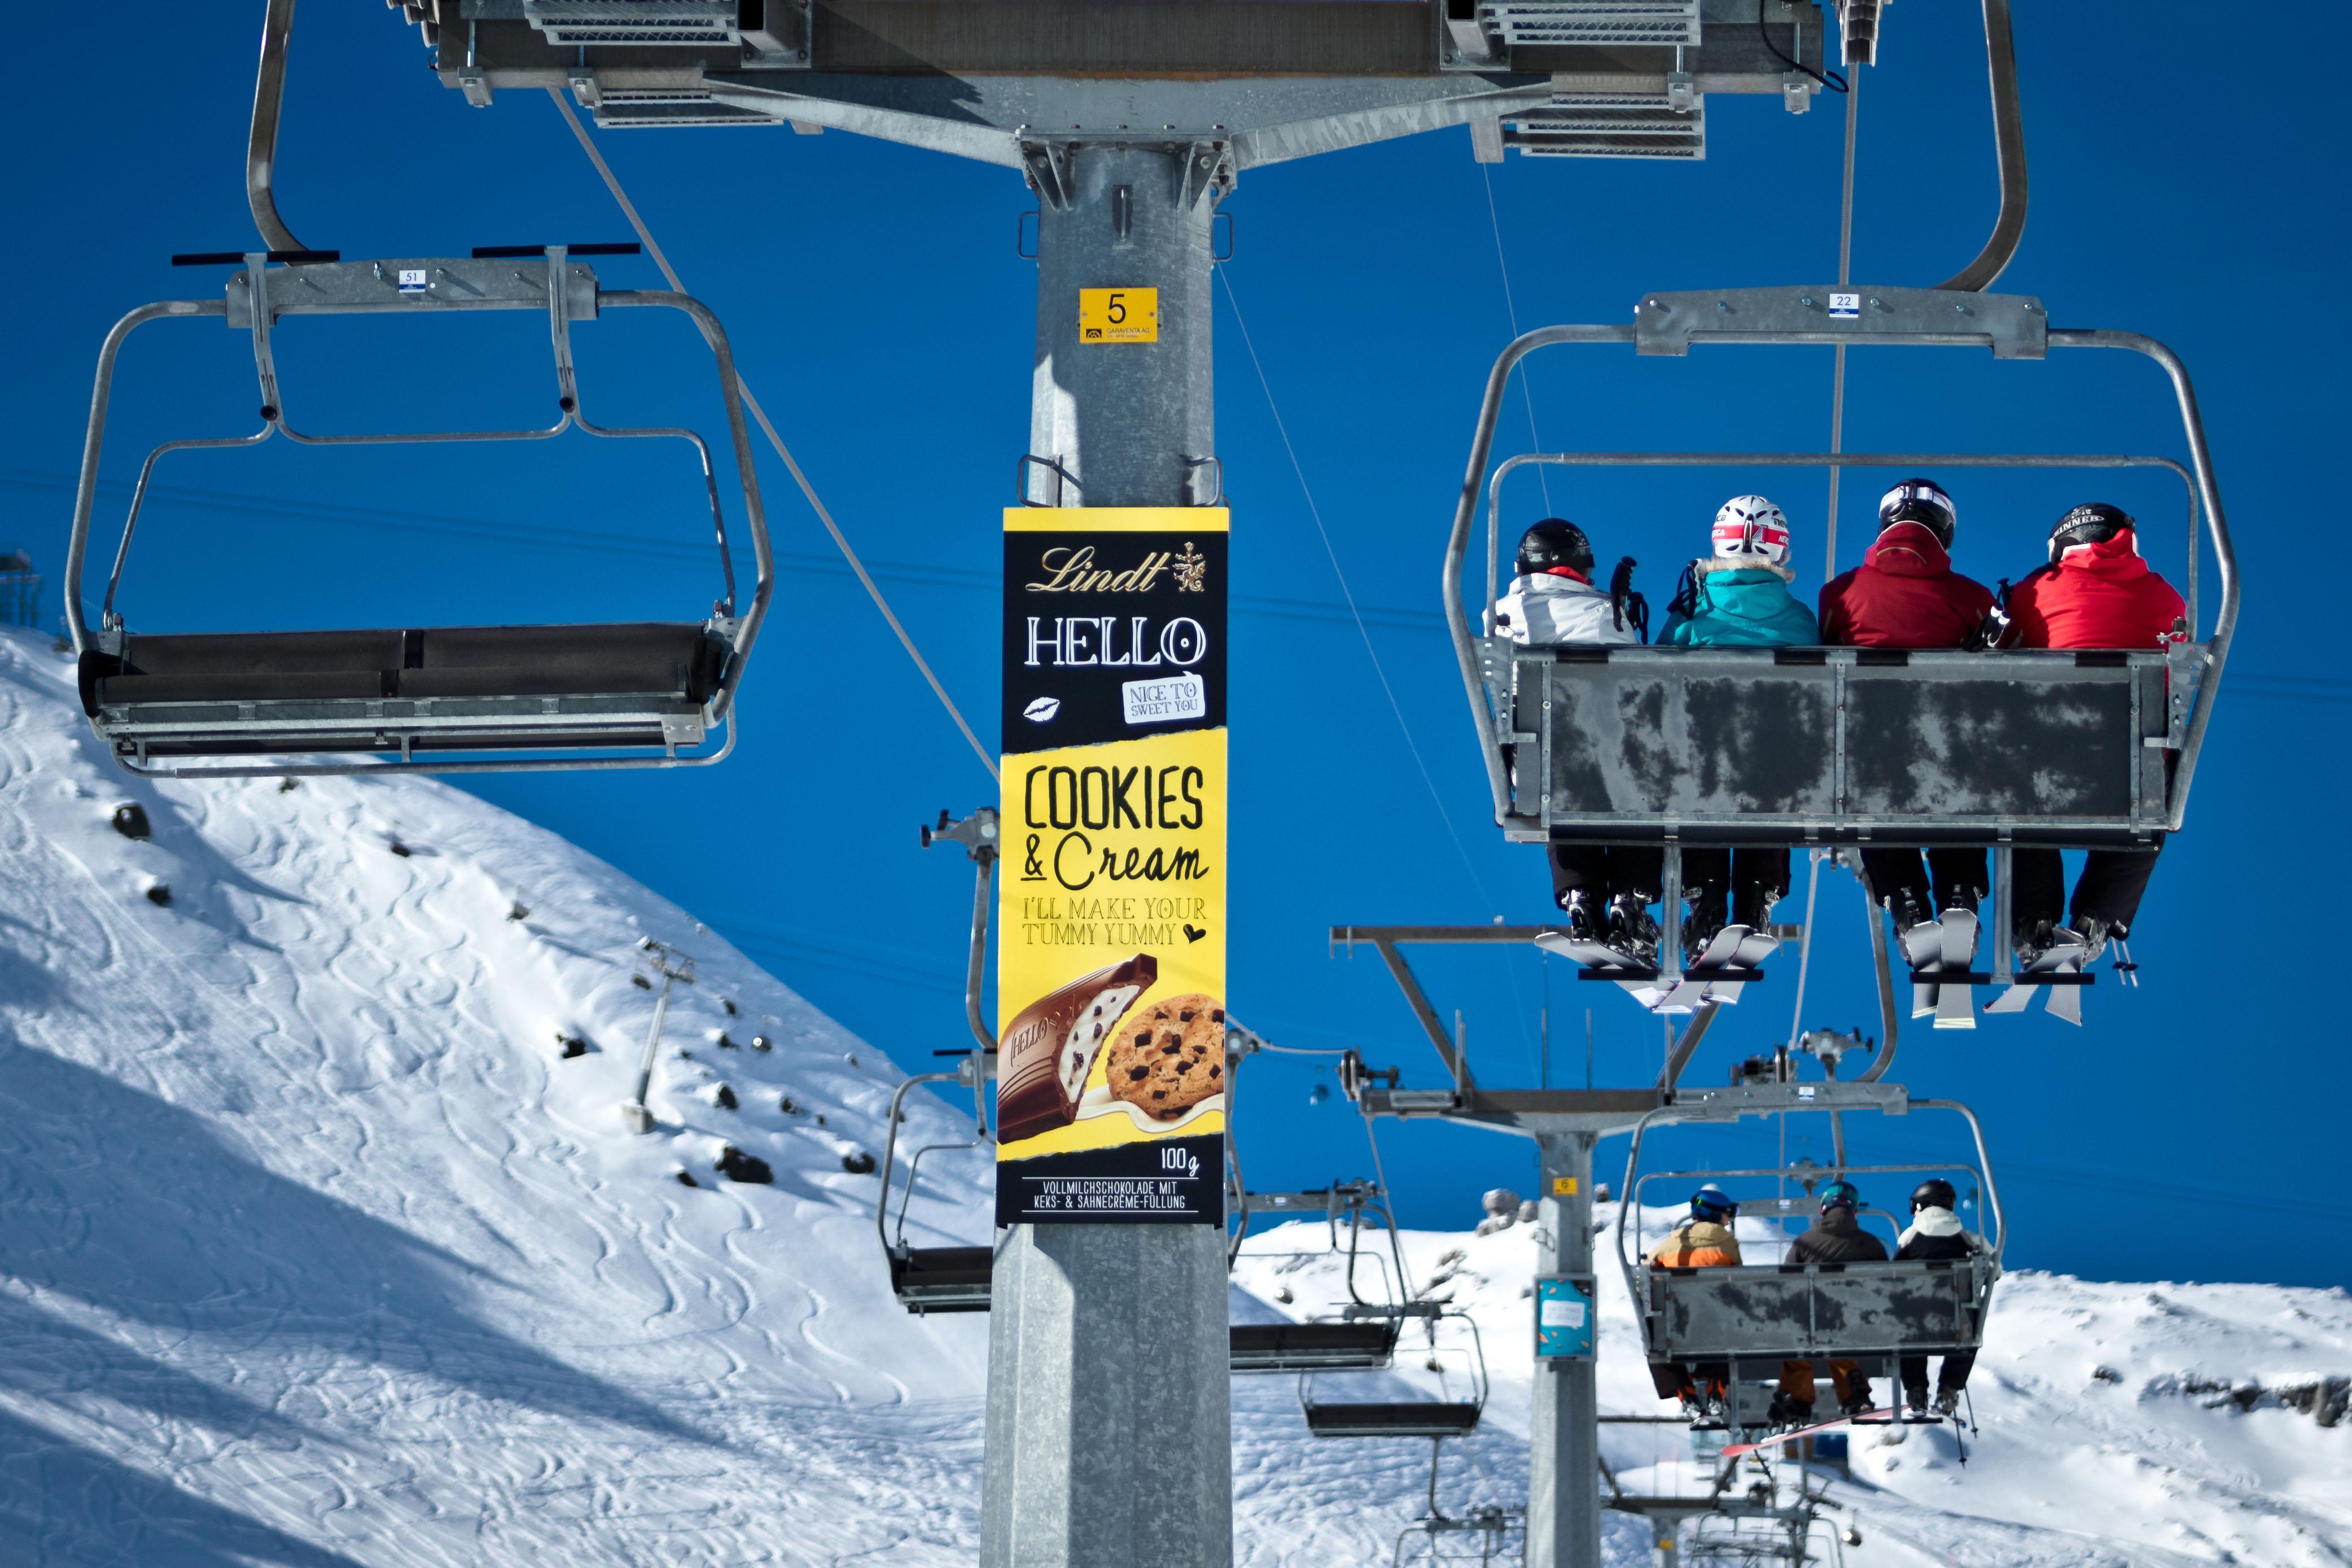 Lift pylone posters